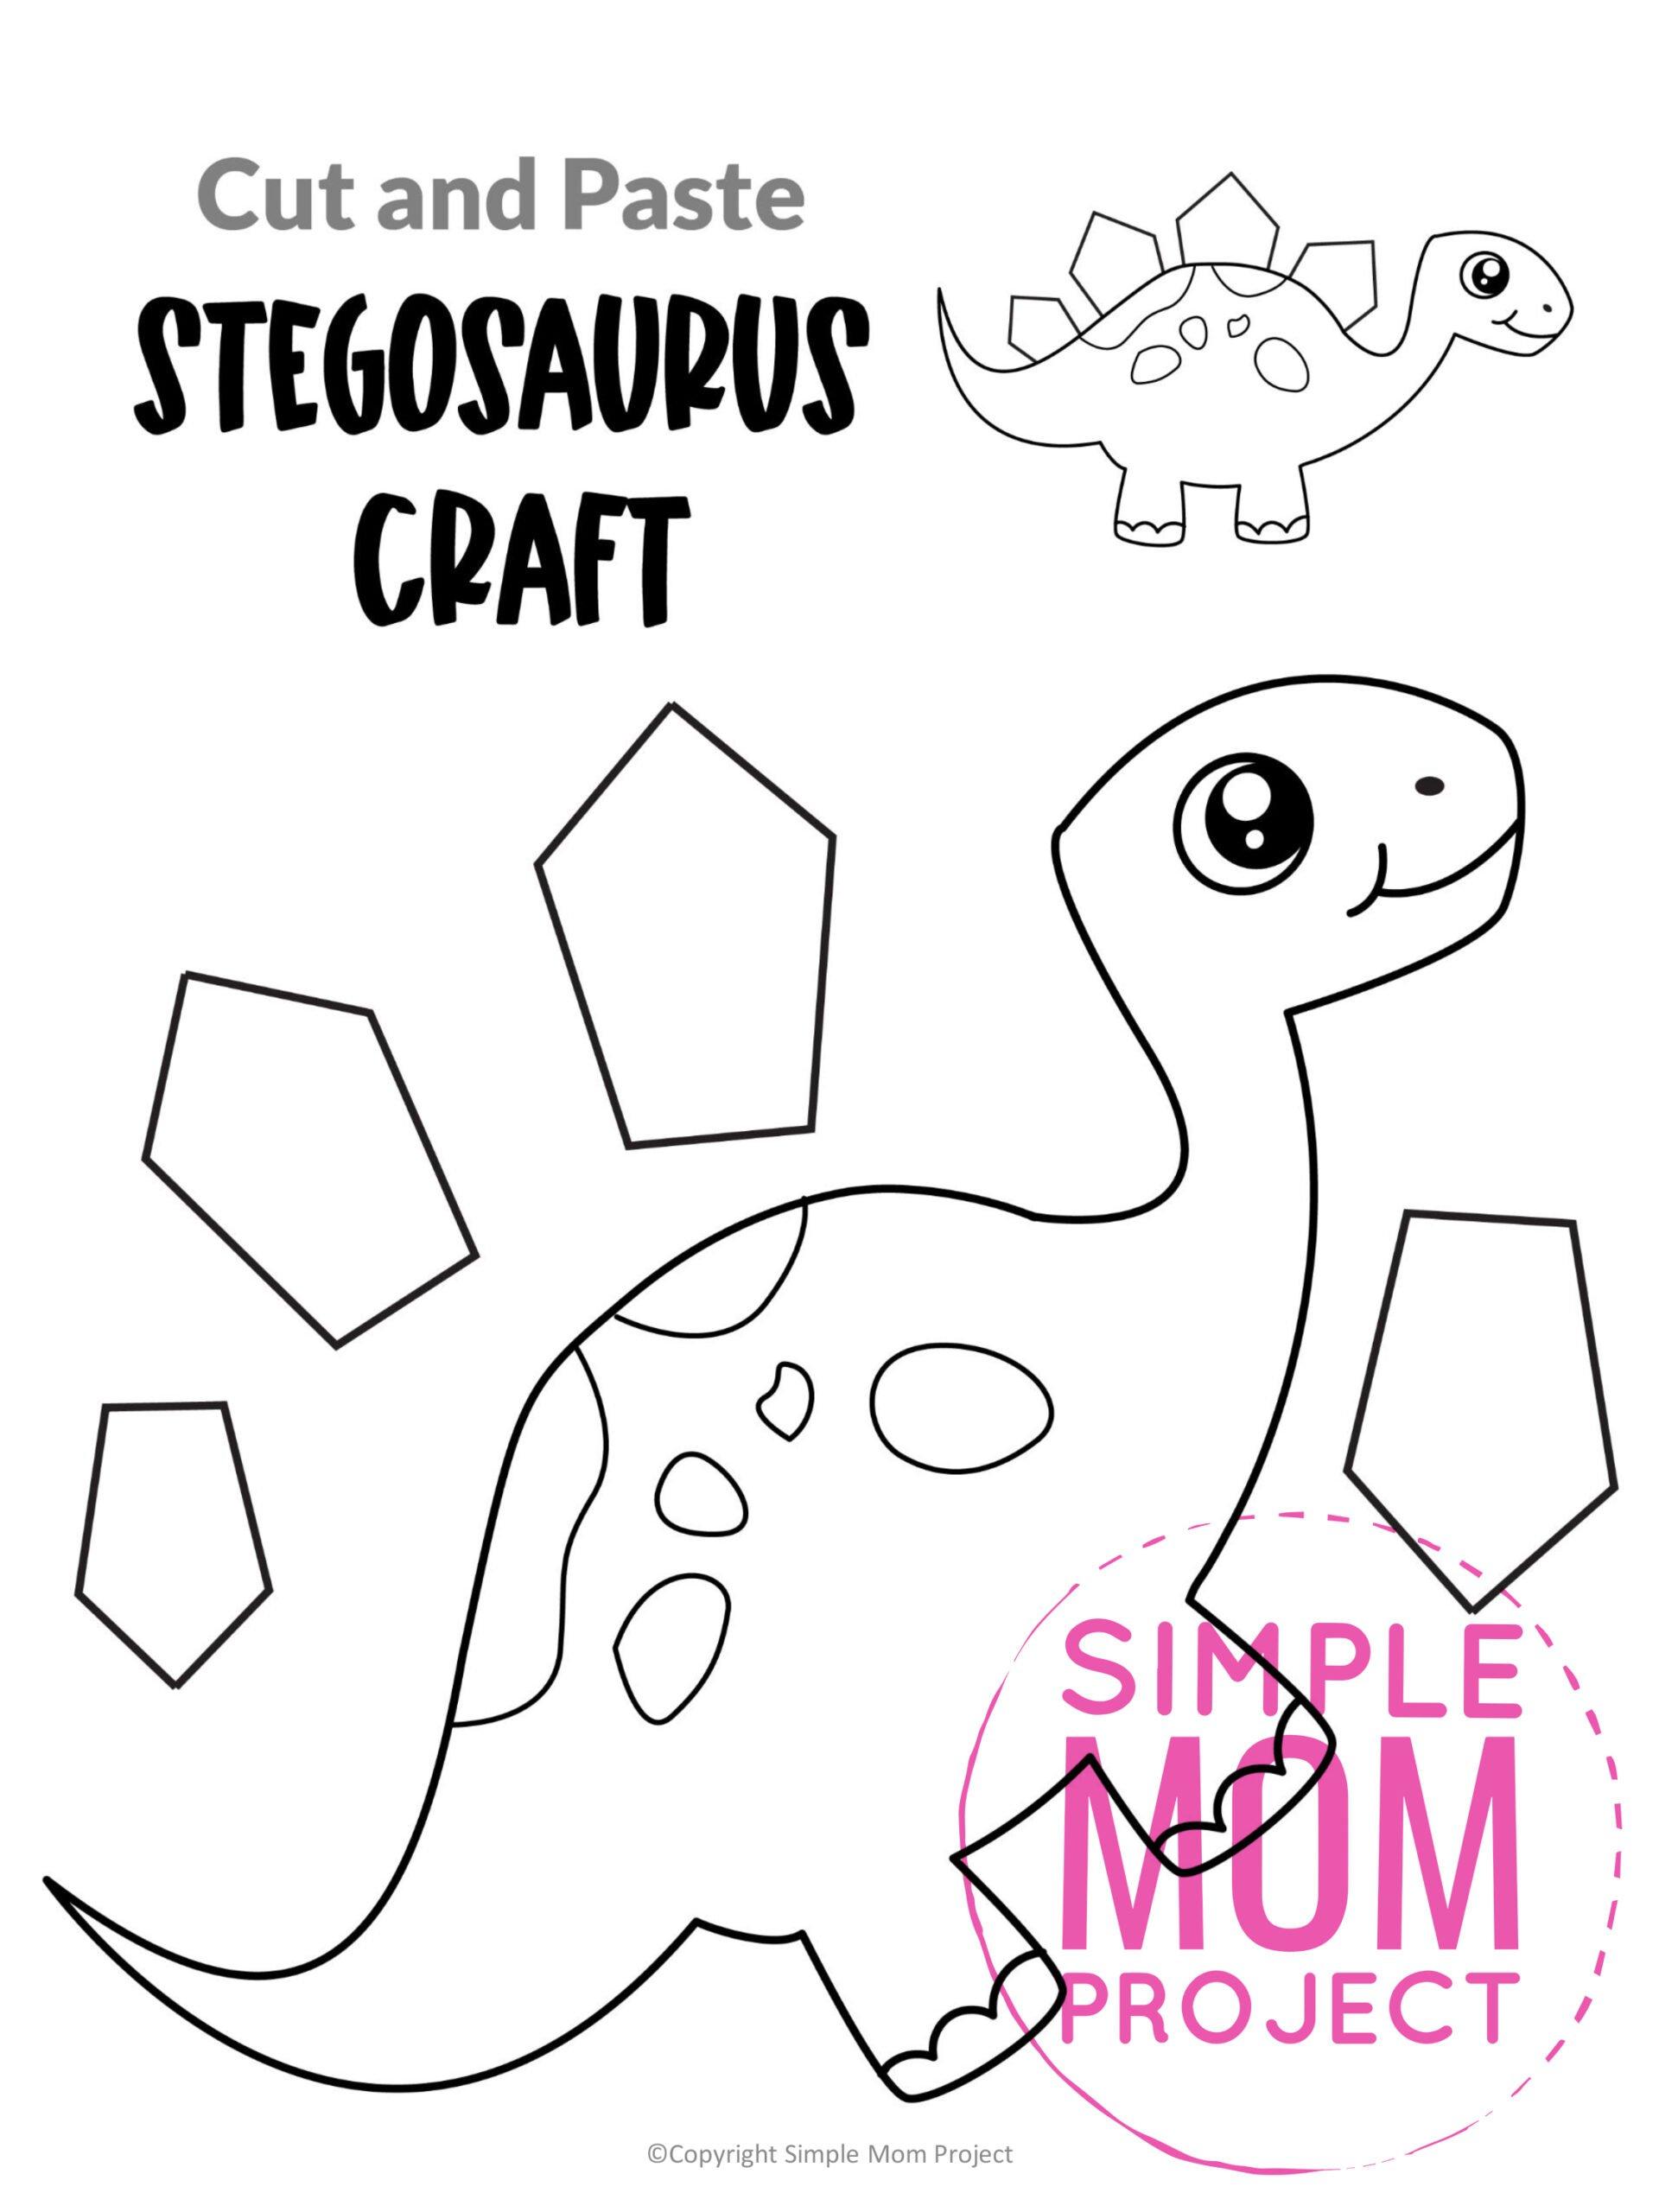 Printable Stegosaurus Dinosaur Craft for Preschoolers, toddlers and kindergartners